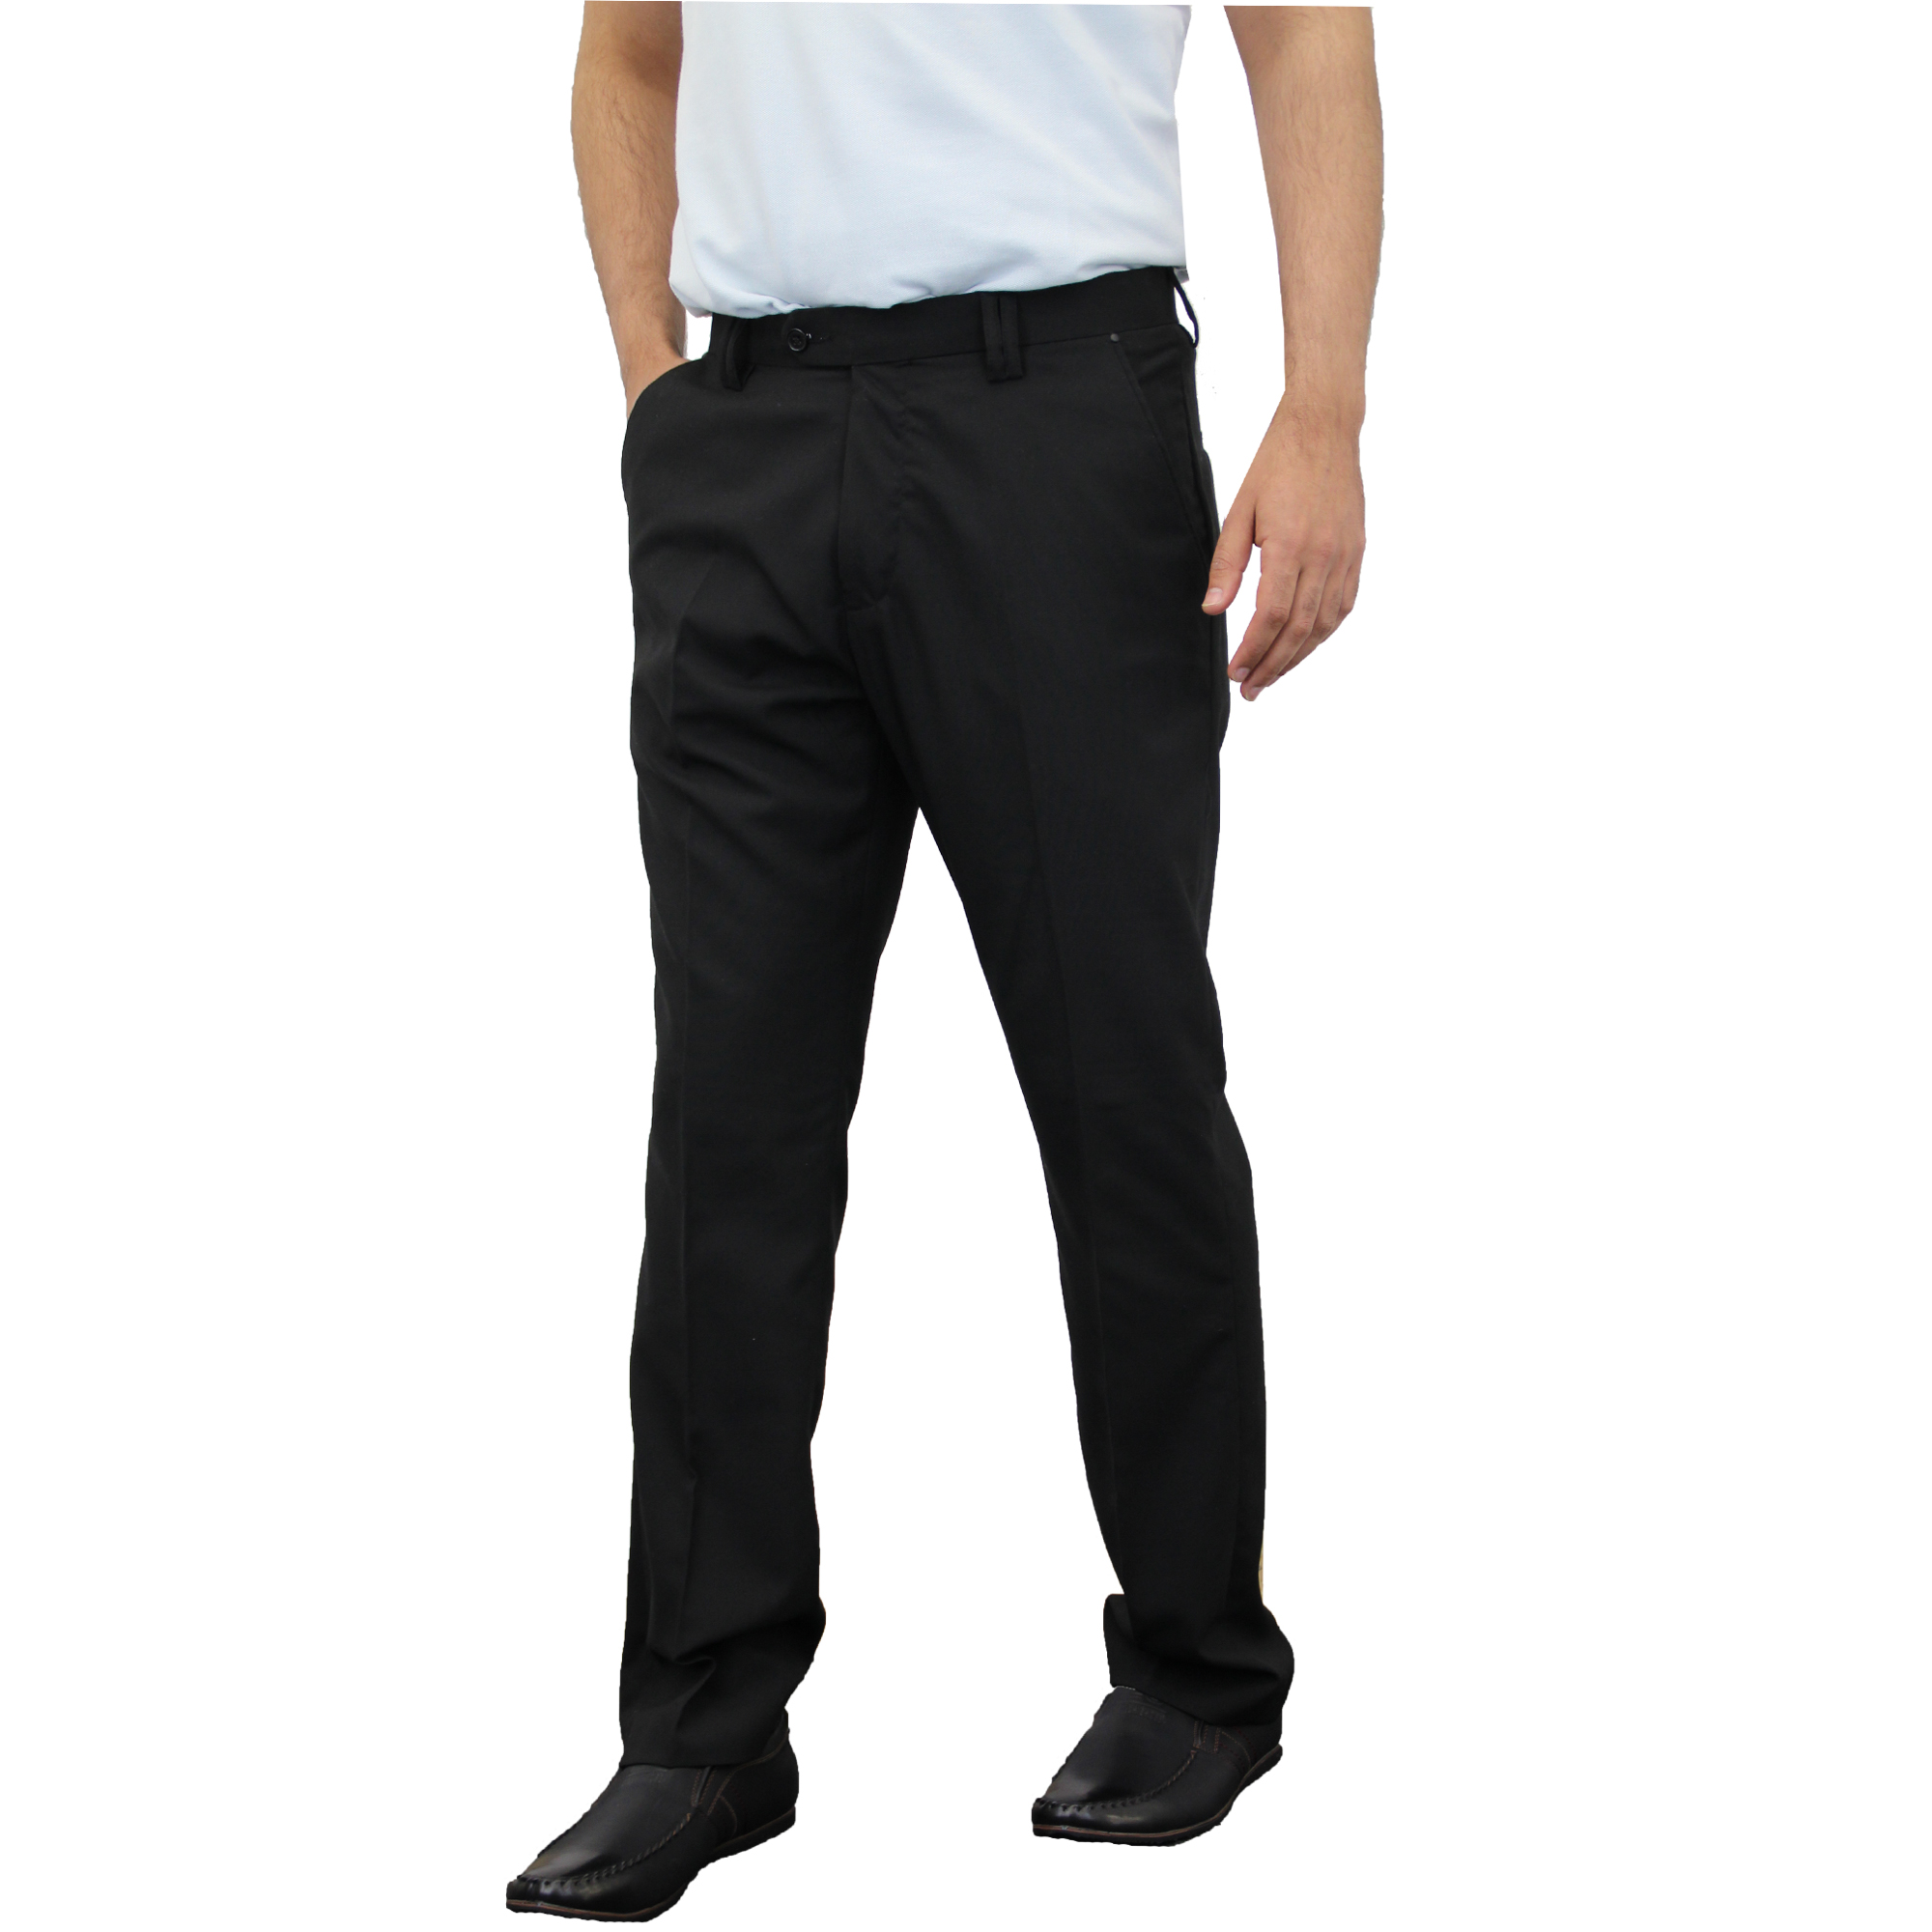 Mens Trouser Soul London Formal Dress Pant Office Work Wedding Casual Designer | EBay